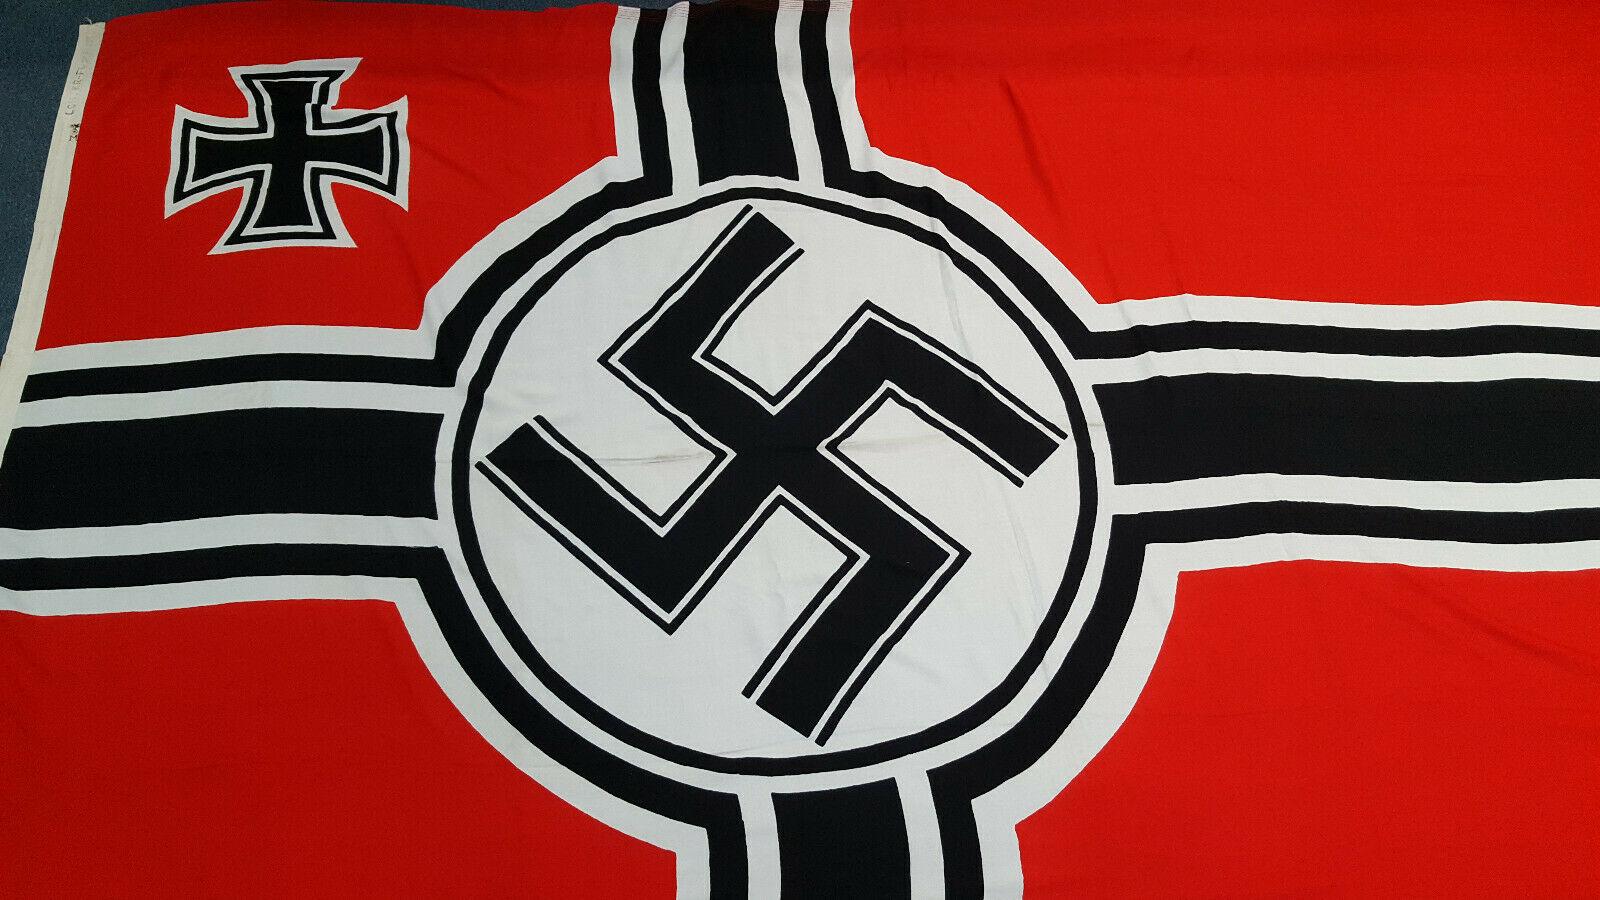 SCARCE LARGE WW2 GERMAN KRIEGSMARINE NAVAL BATTLE FLAG 3 METRES LOH MARKED